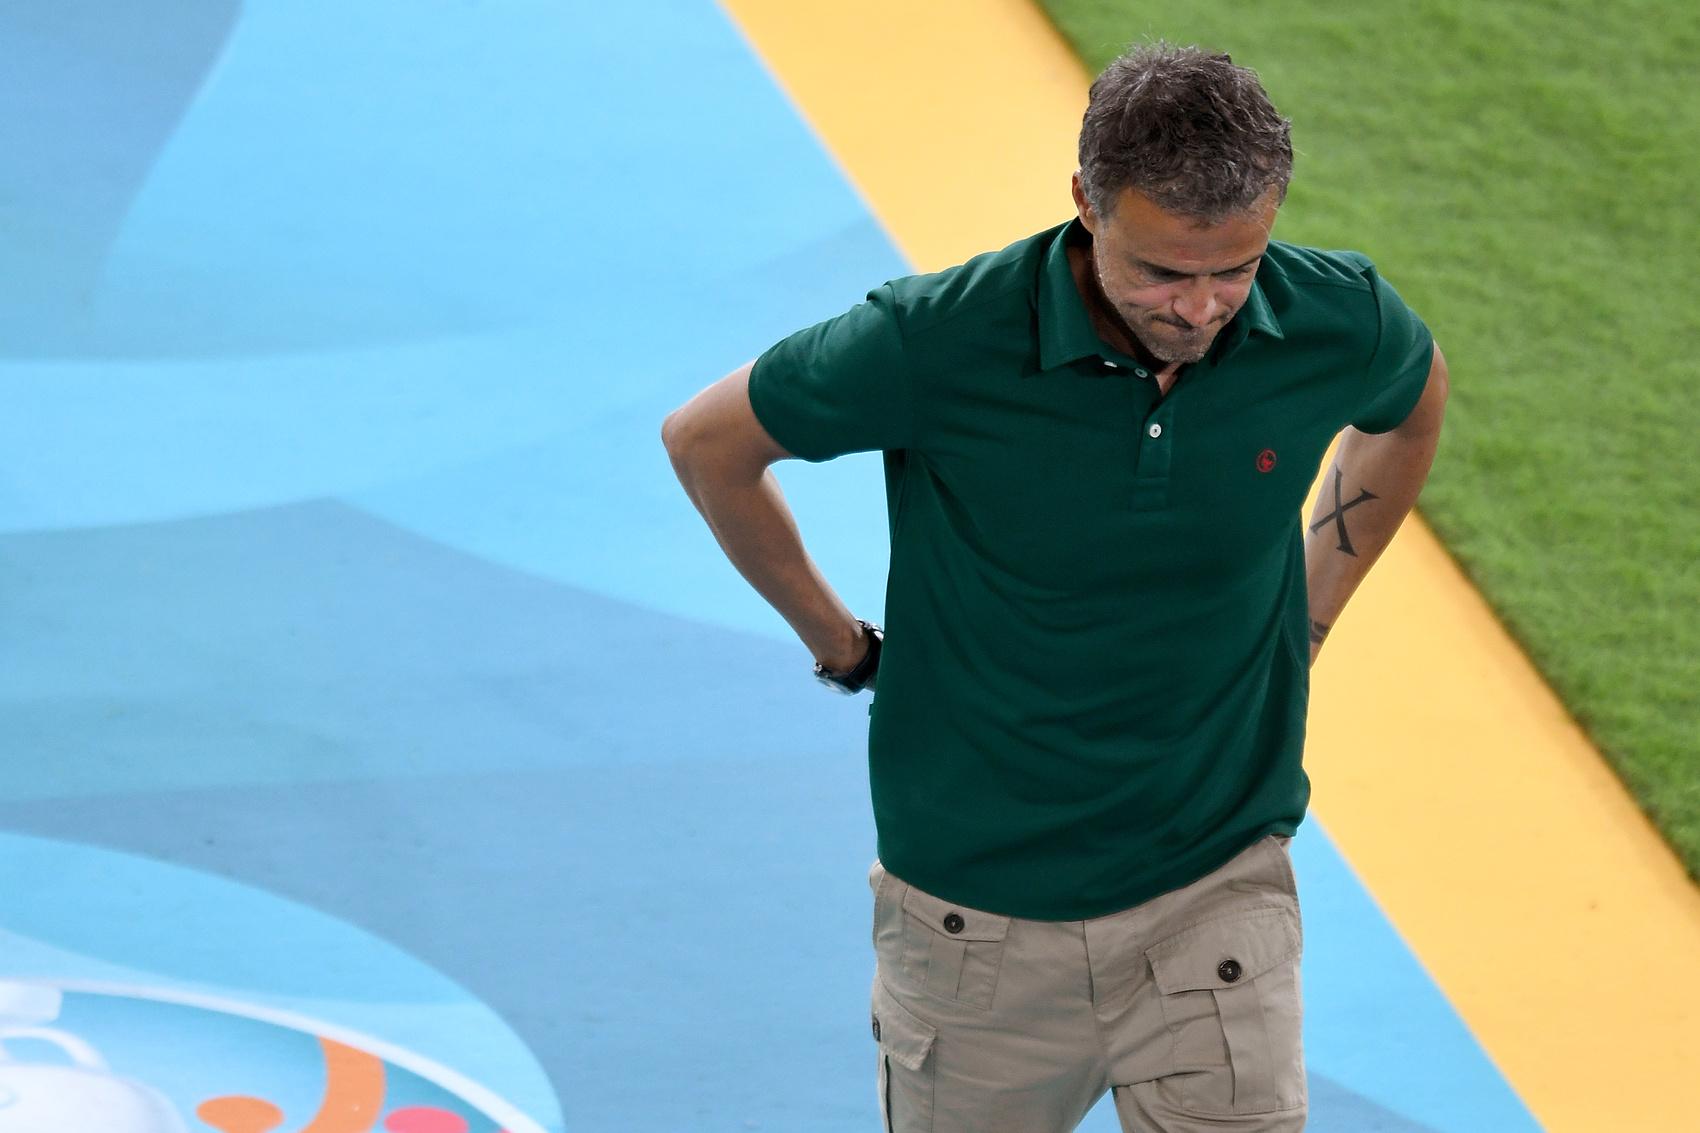 Enrique, trener hiszpanii